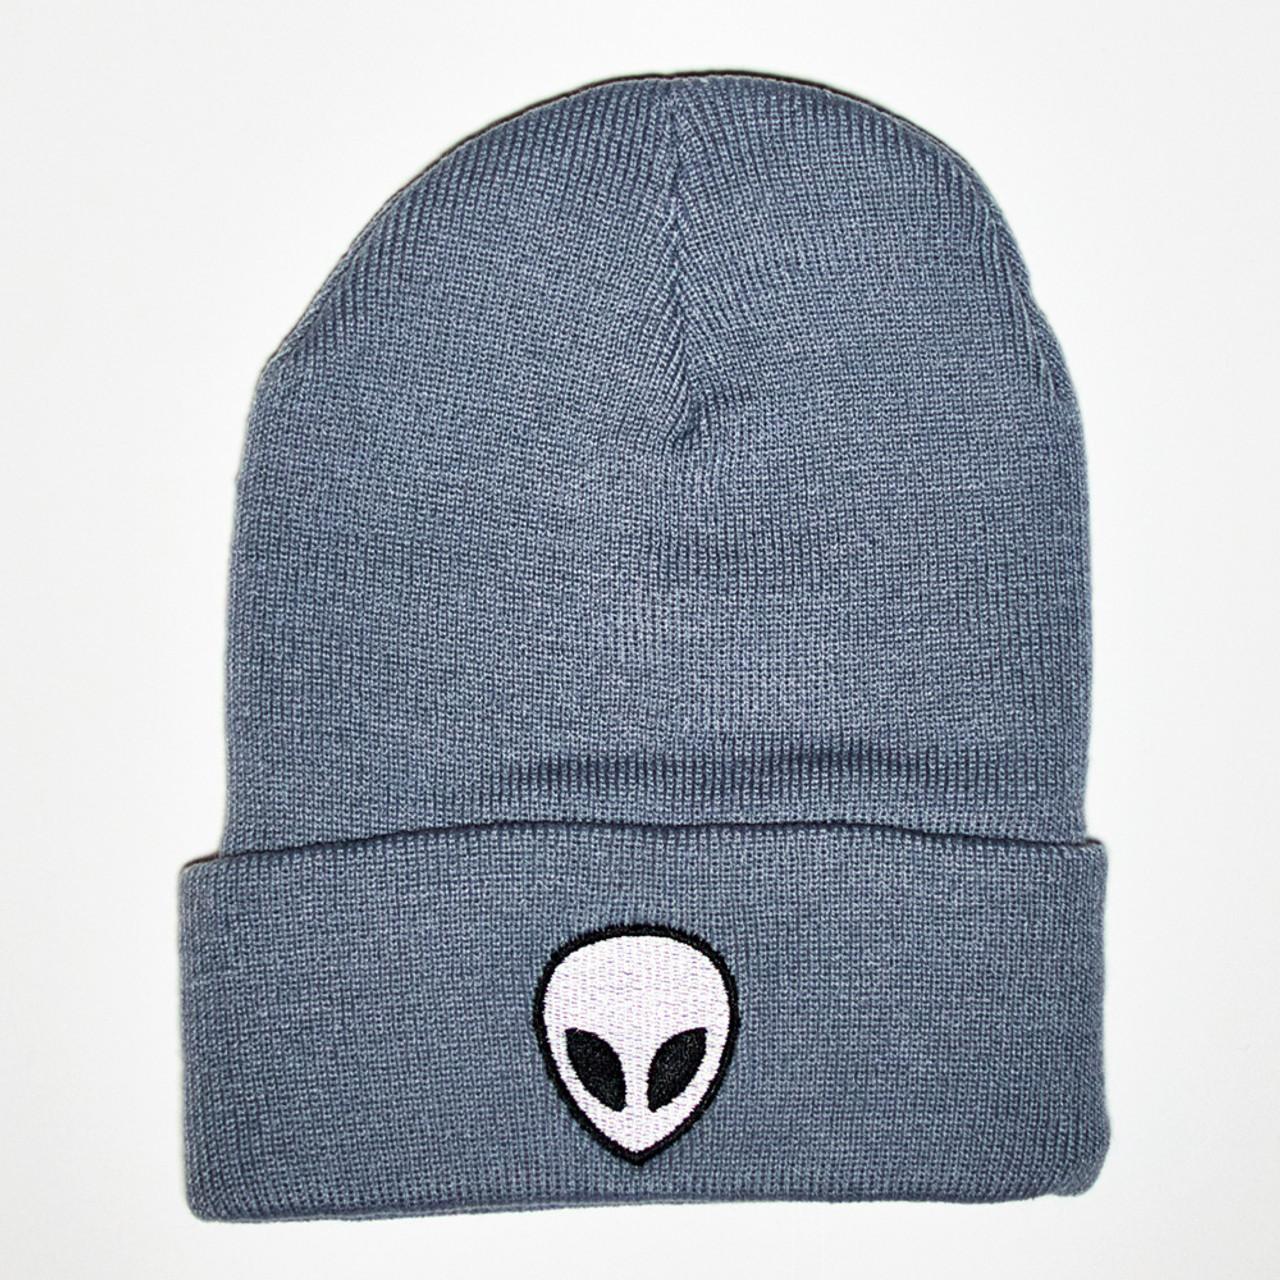 8cbab04707c Alien Beanie - Gray - The UFO Congress Store